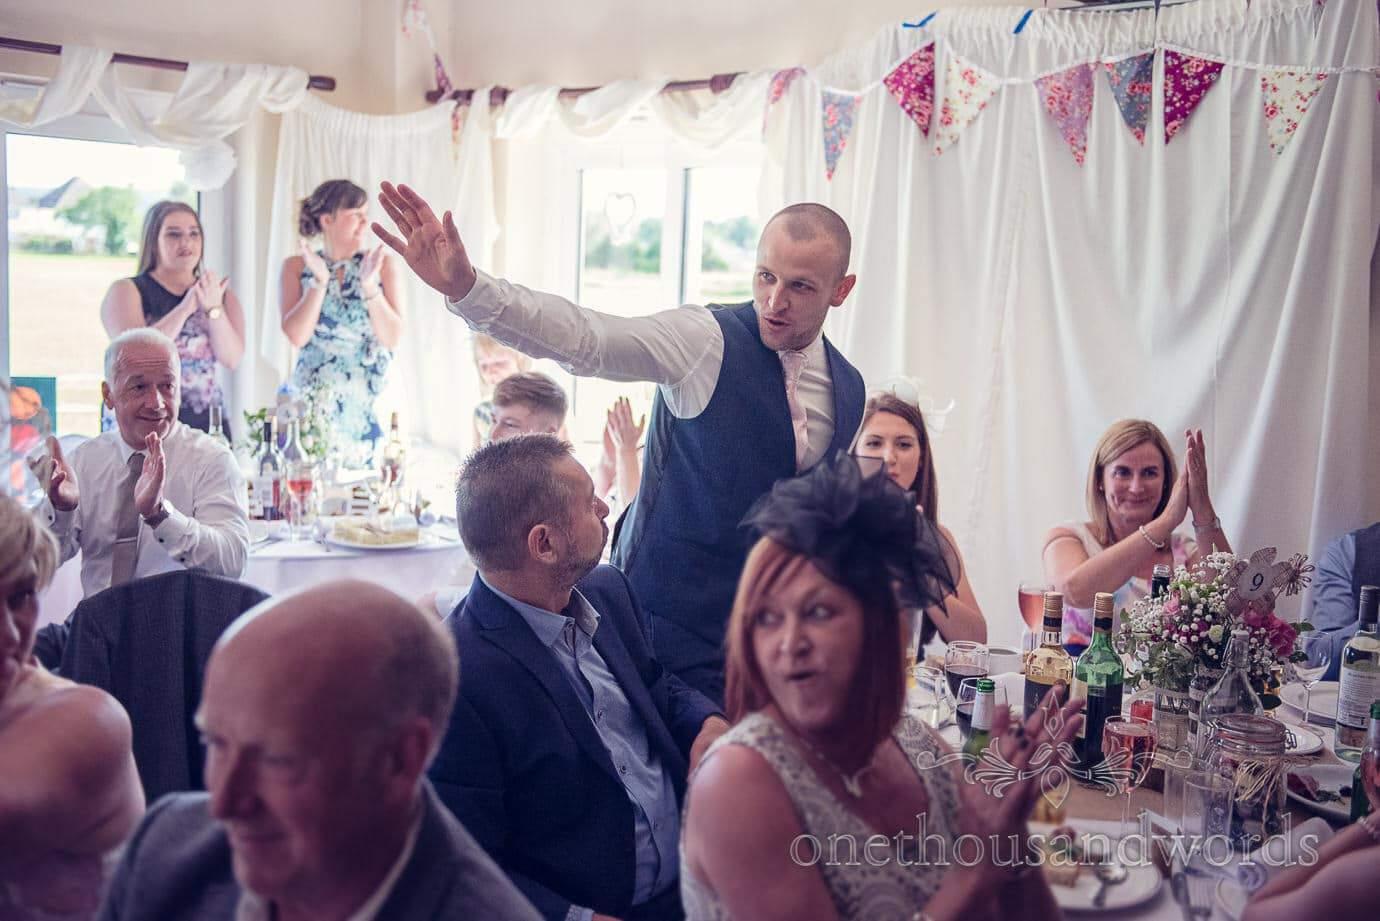 Wedding guest stands for applaudse during wedding speeches